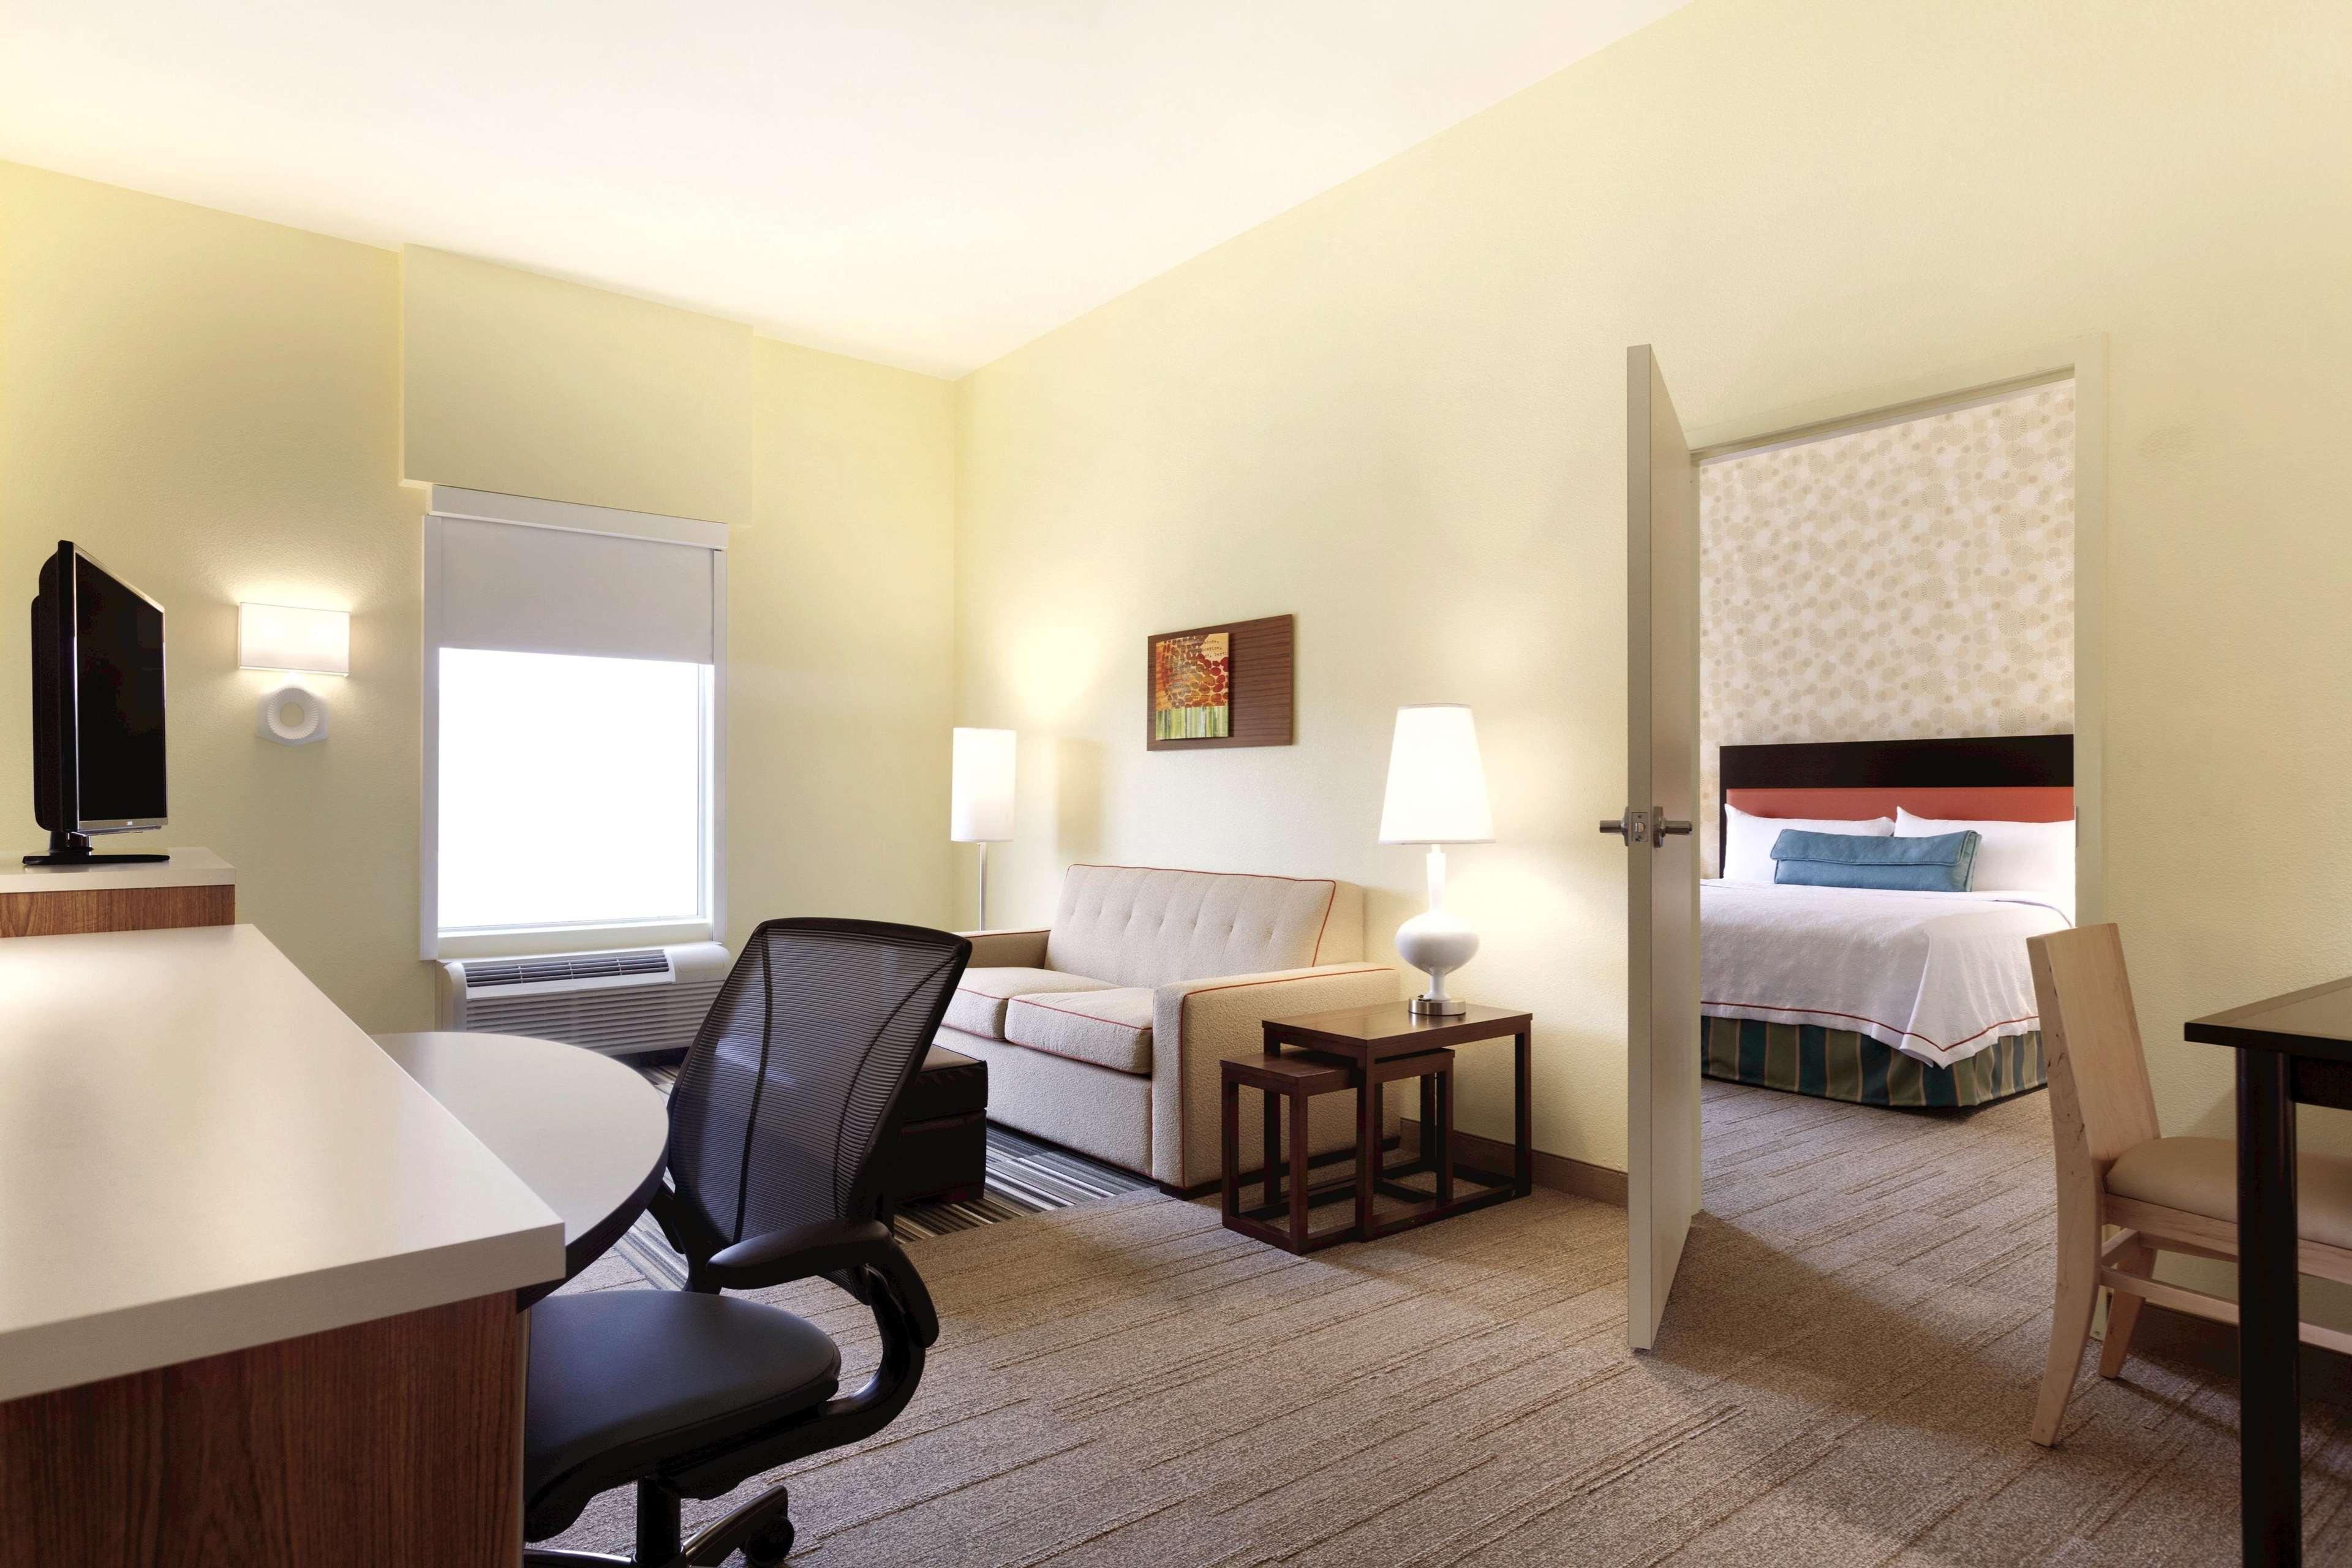 Home2 Suites by Hilton Austin Round Rock image 18